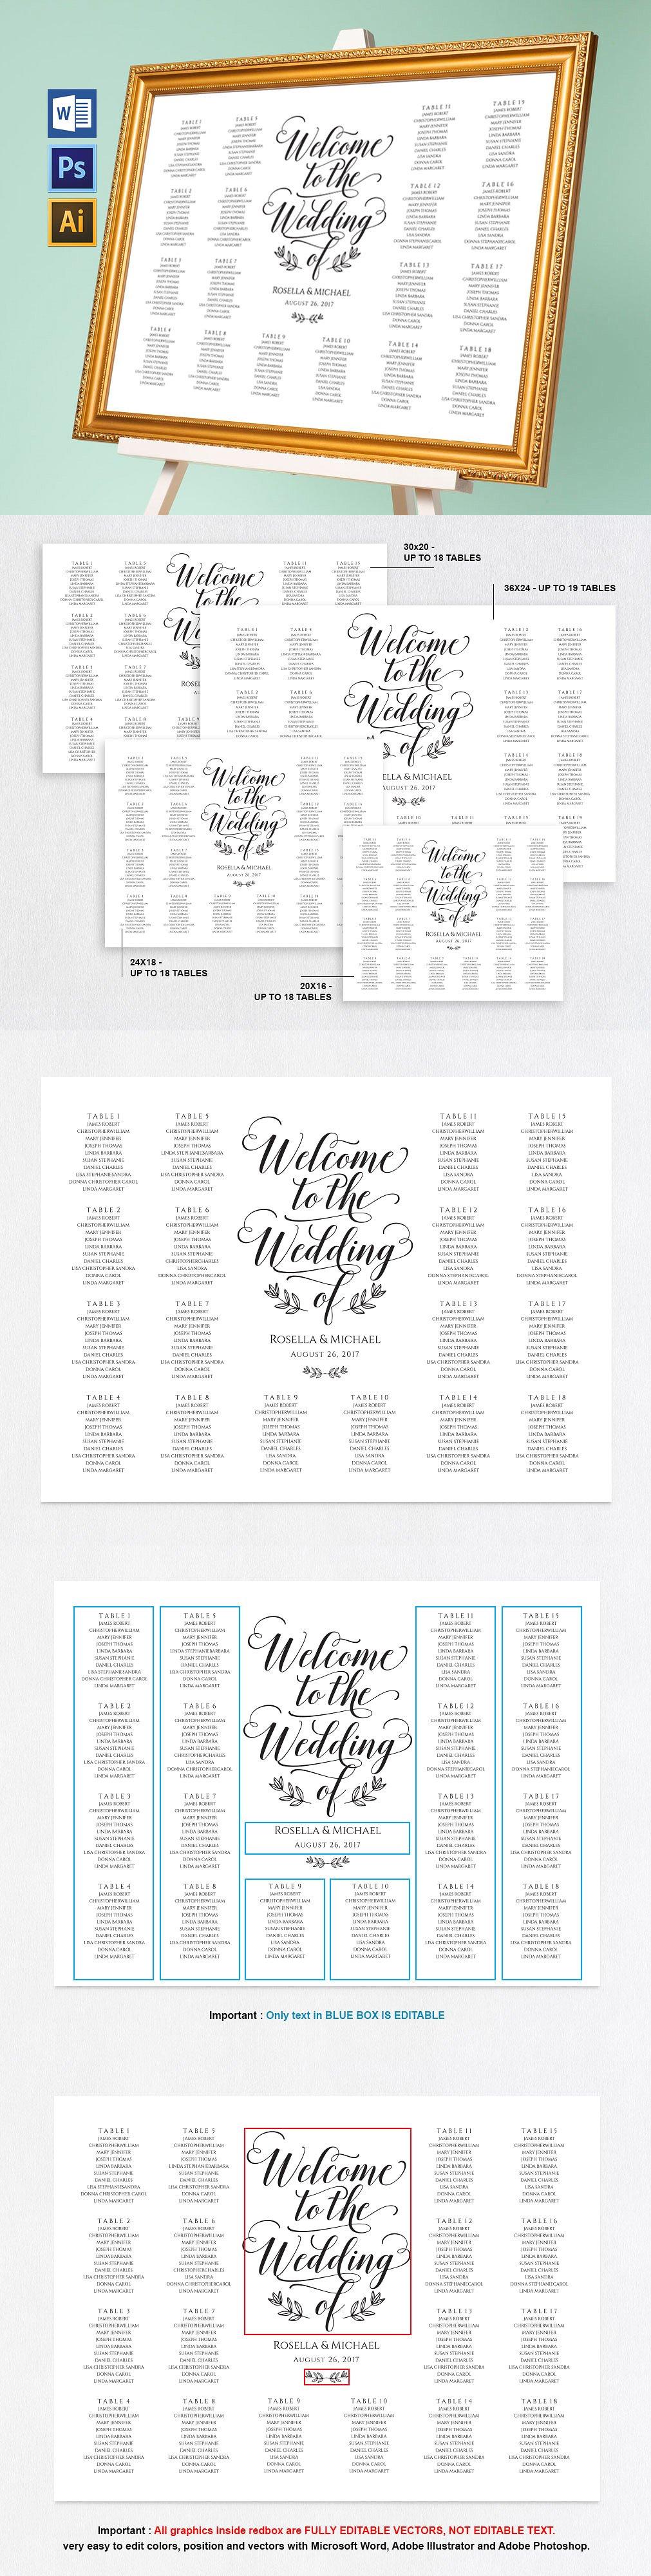 Wedding seating chart Wpc171 Template AI, EPS, PSD | Invitation ...